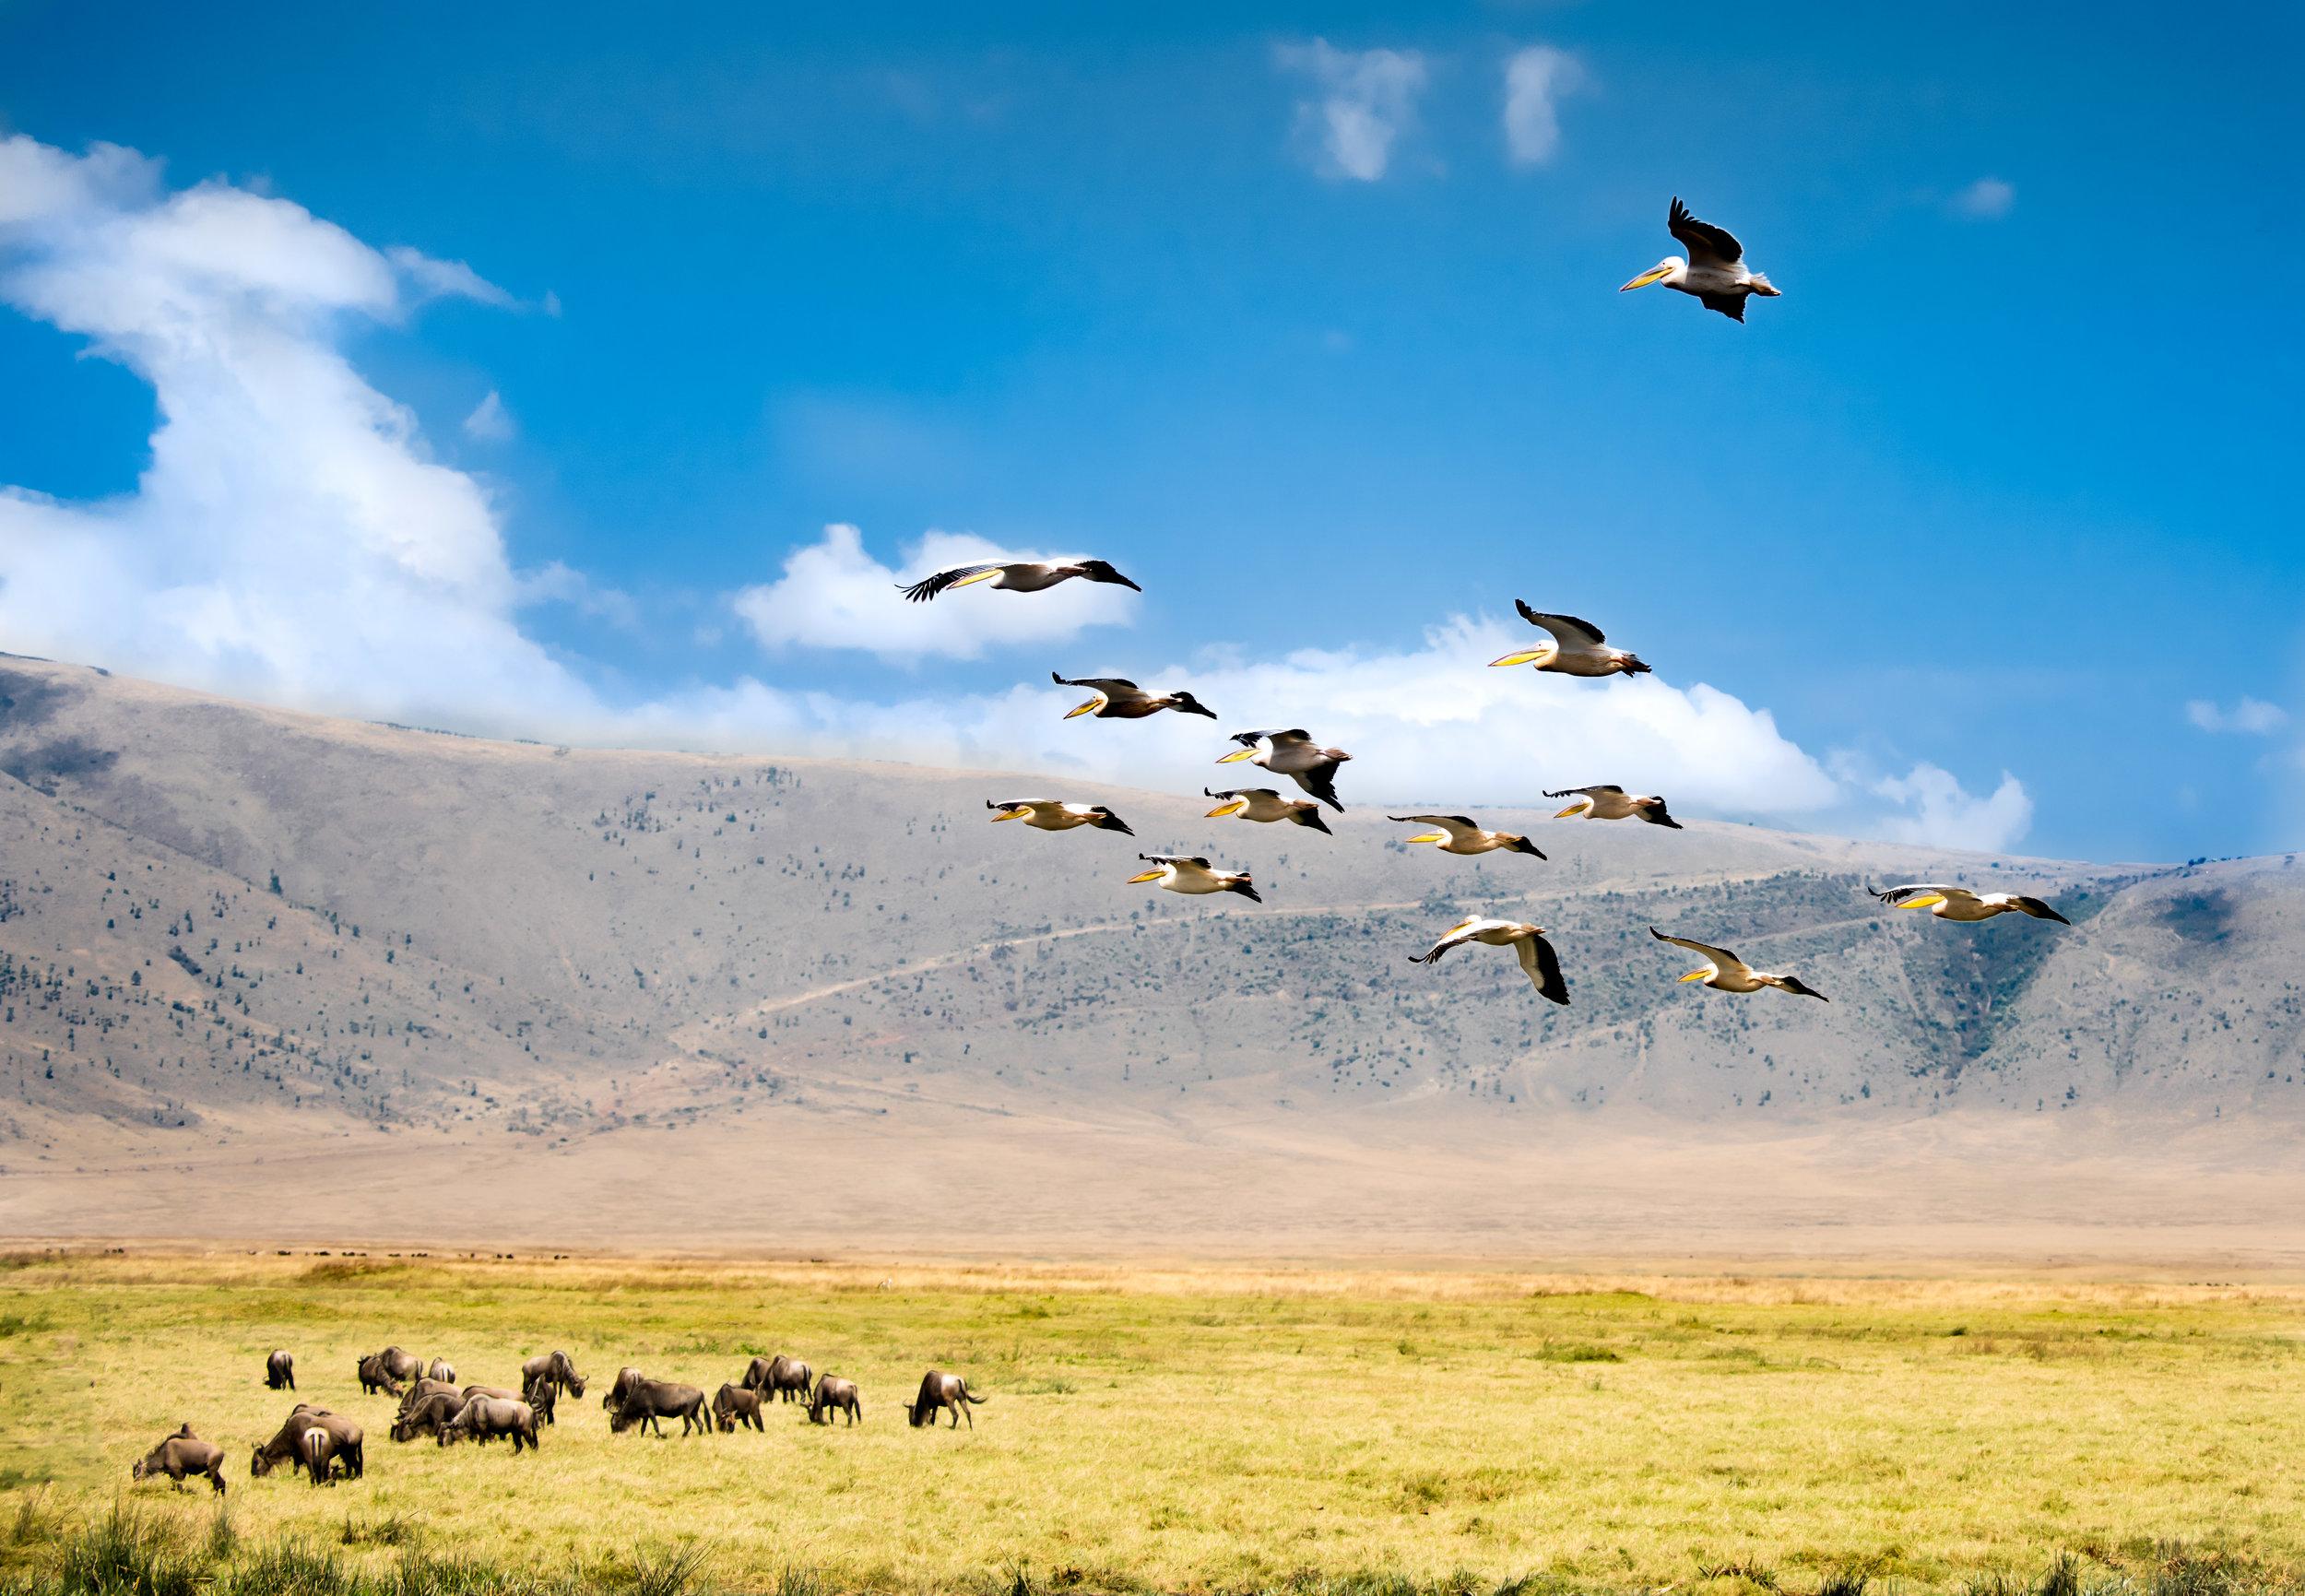 Tanzania-Earth-Photo-By-Tricia-Suriani-Ramsay-1.jpg